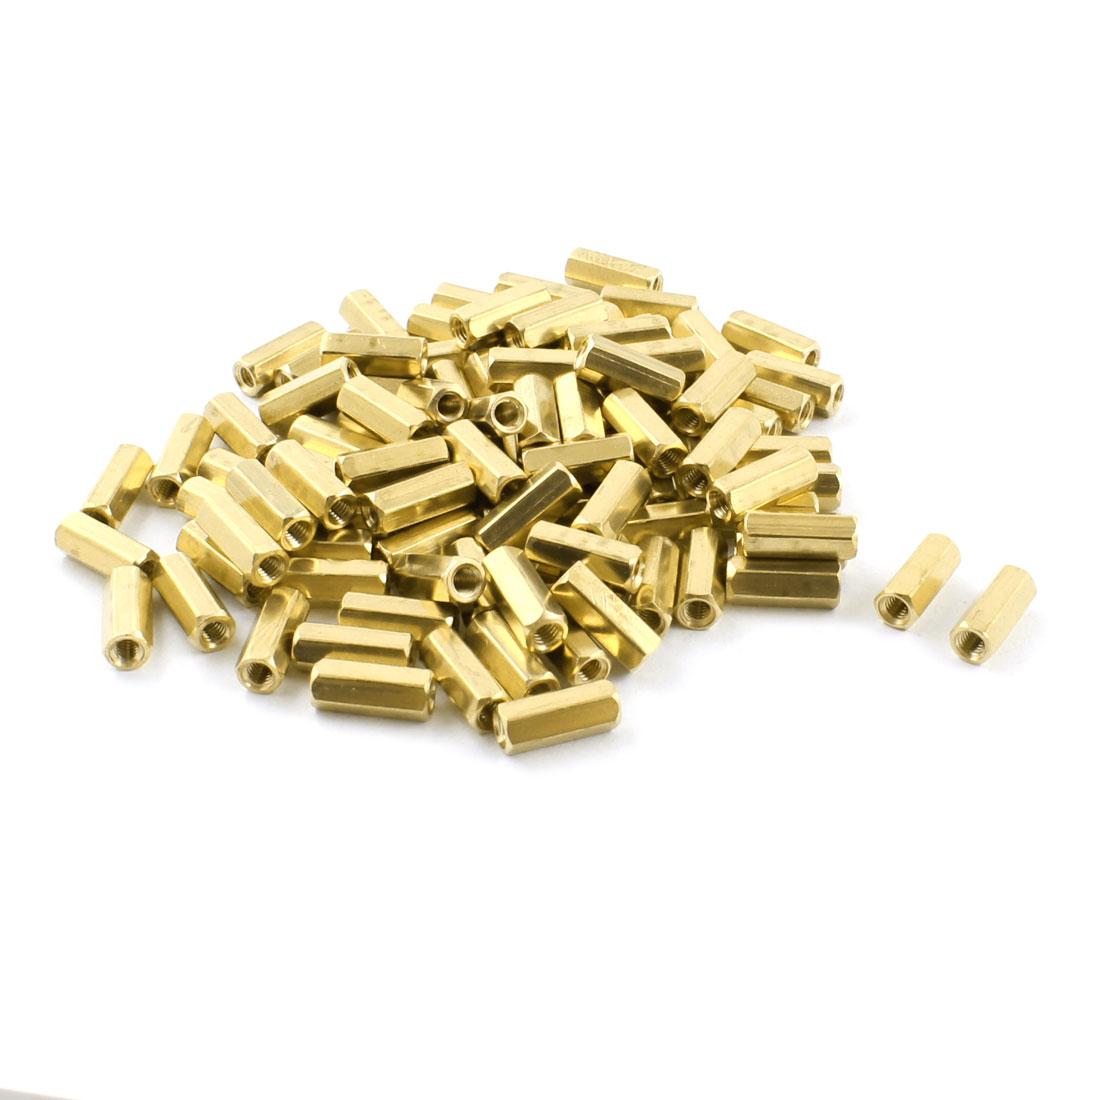 100 Pcs M3 x 12mm Female Thread Dual Ends Brass Pillar PCB Standoff Hexagonal Nut Spacer